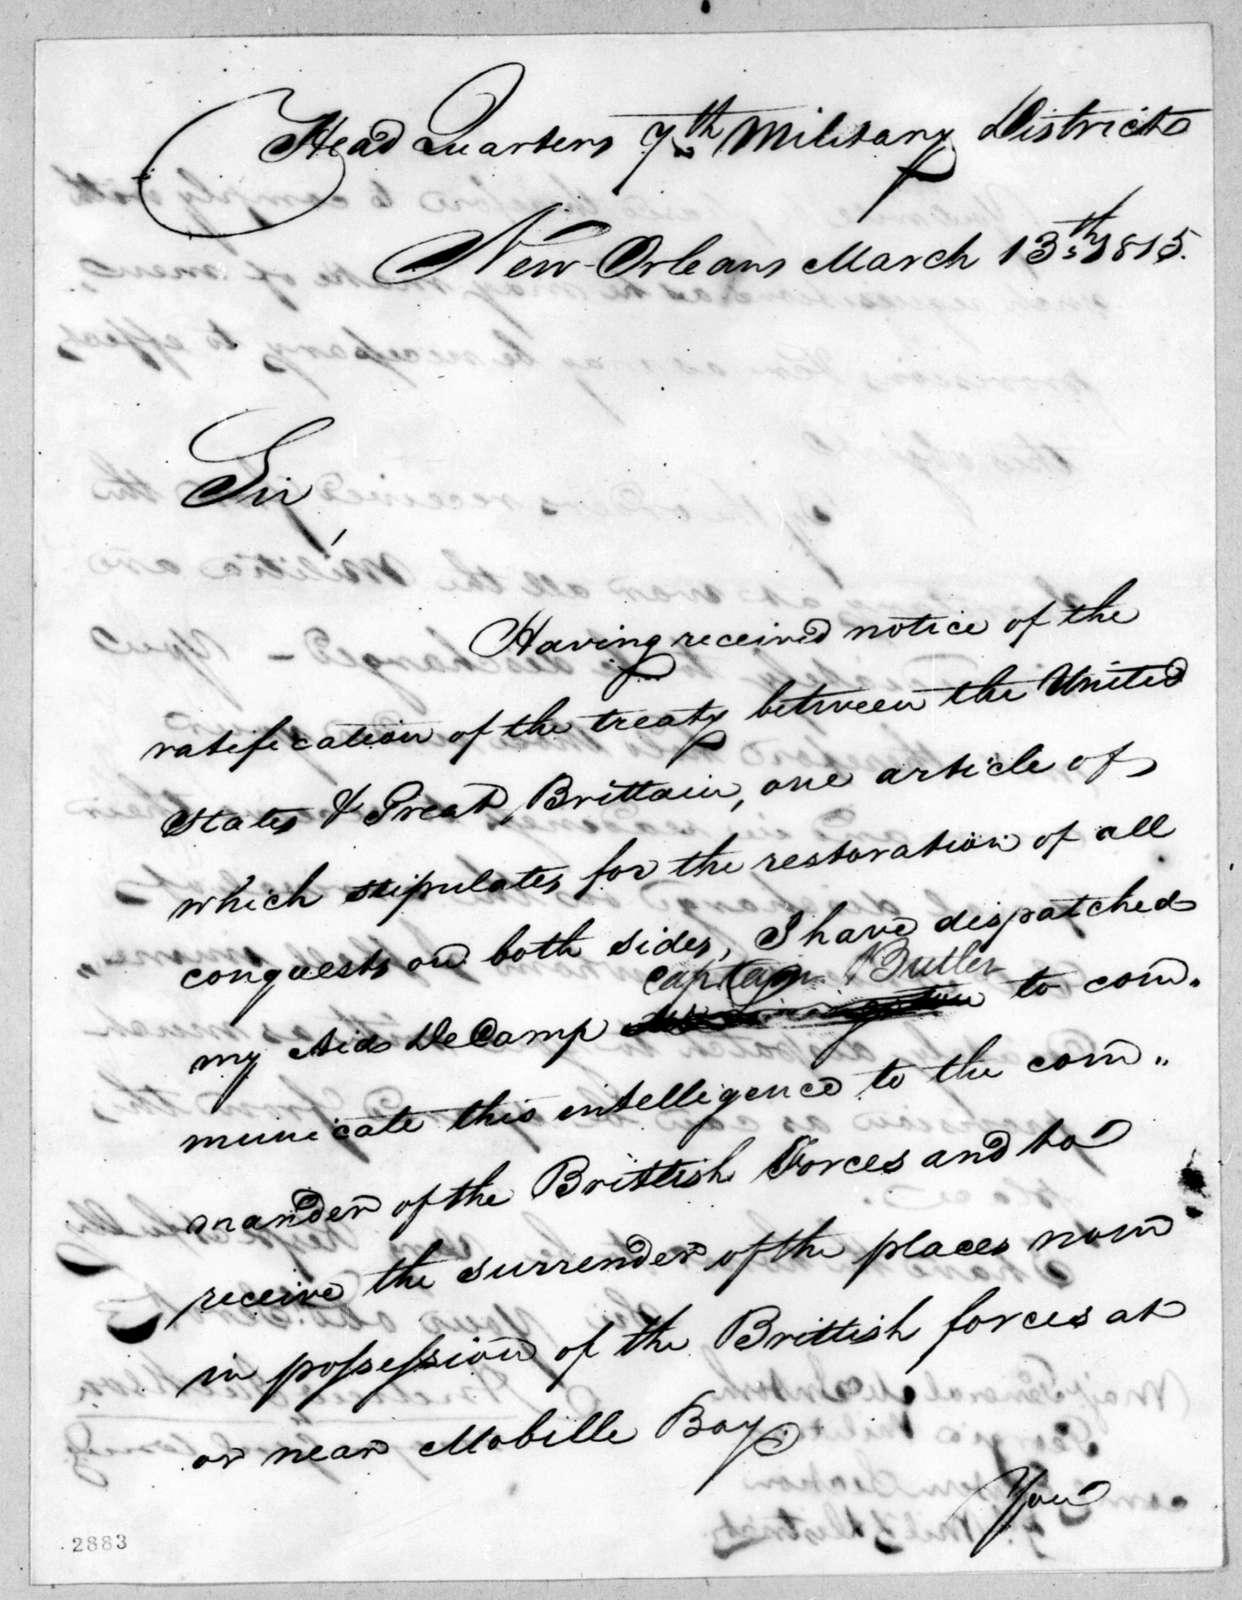 Andrew Jackson to John McIntosh, March 13, 1815